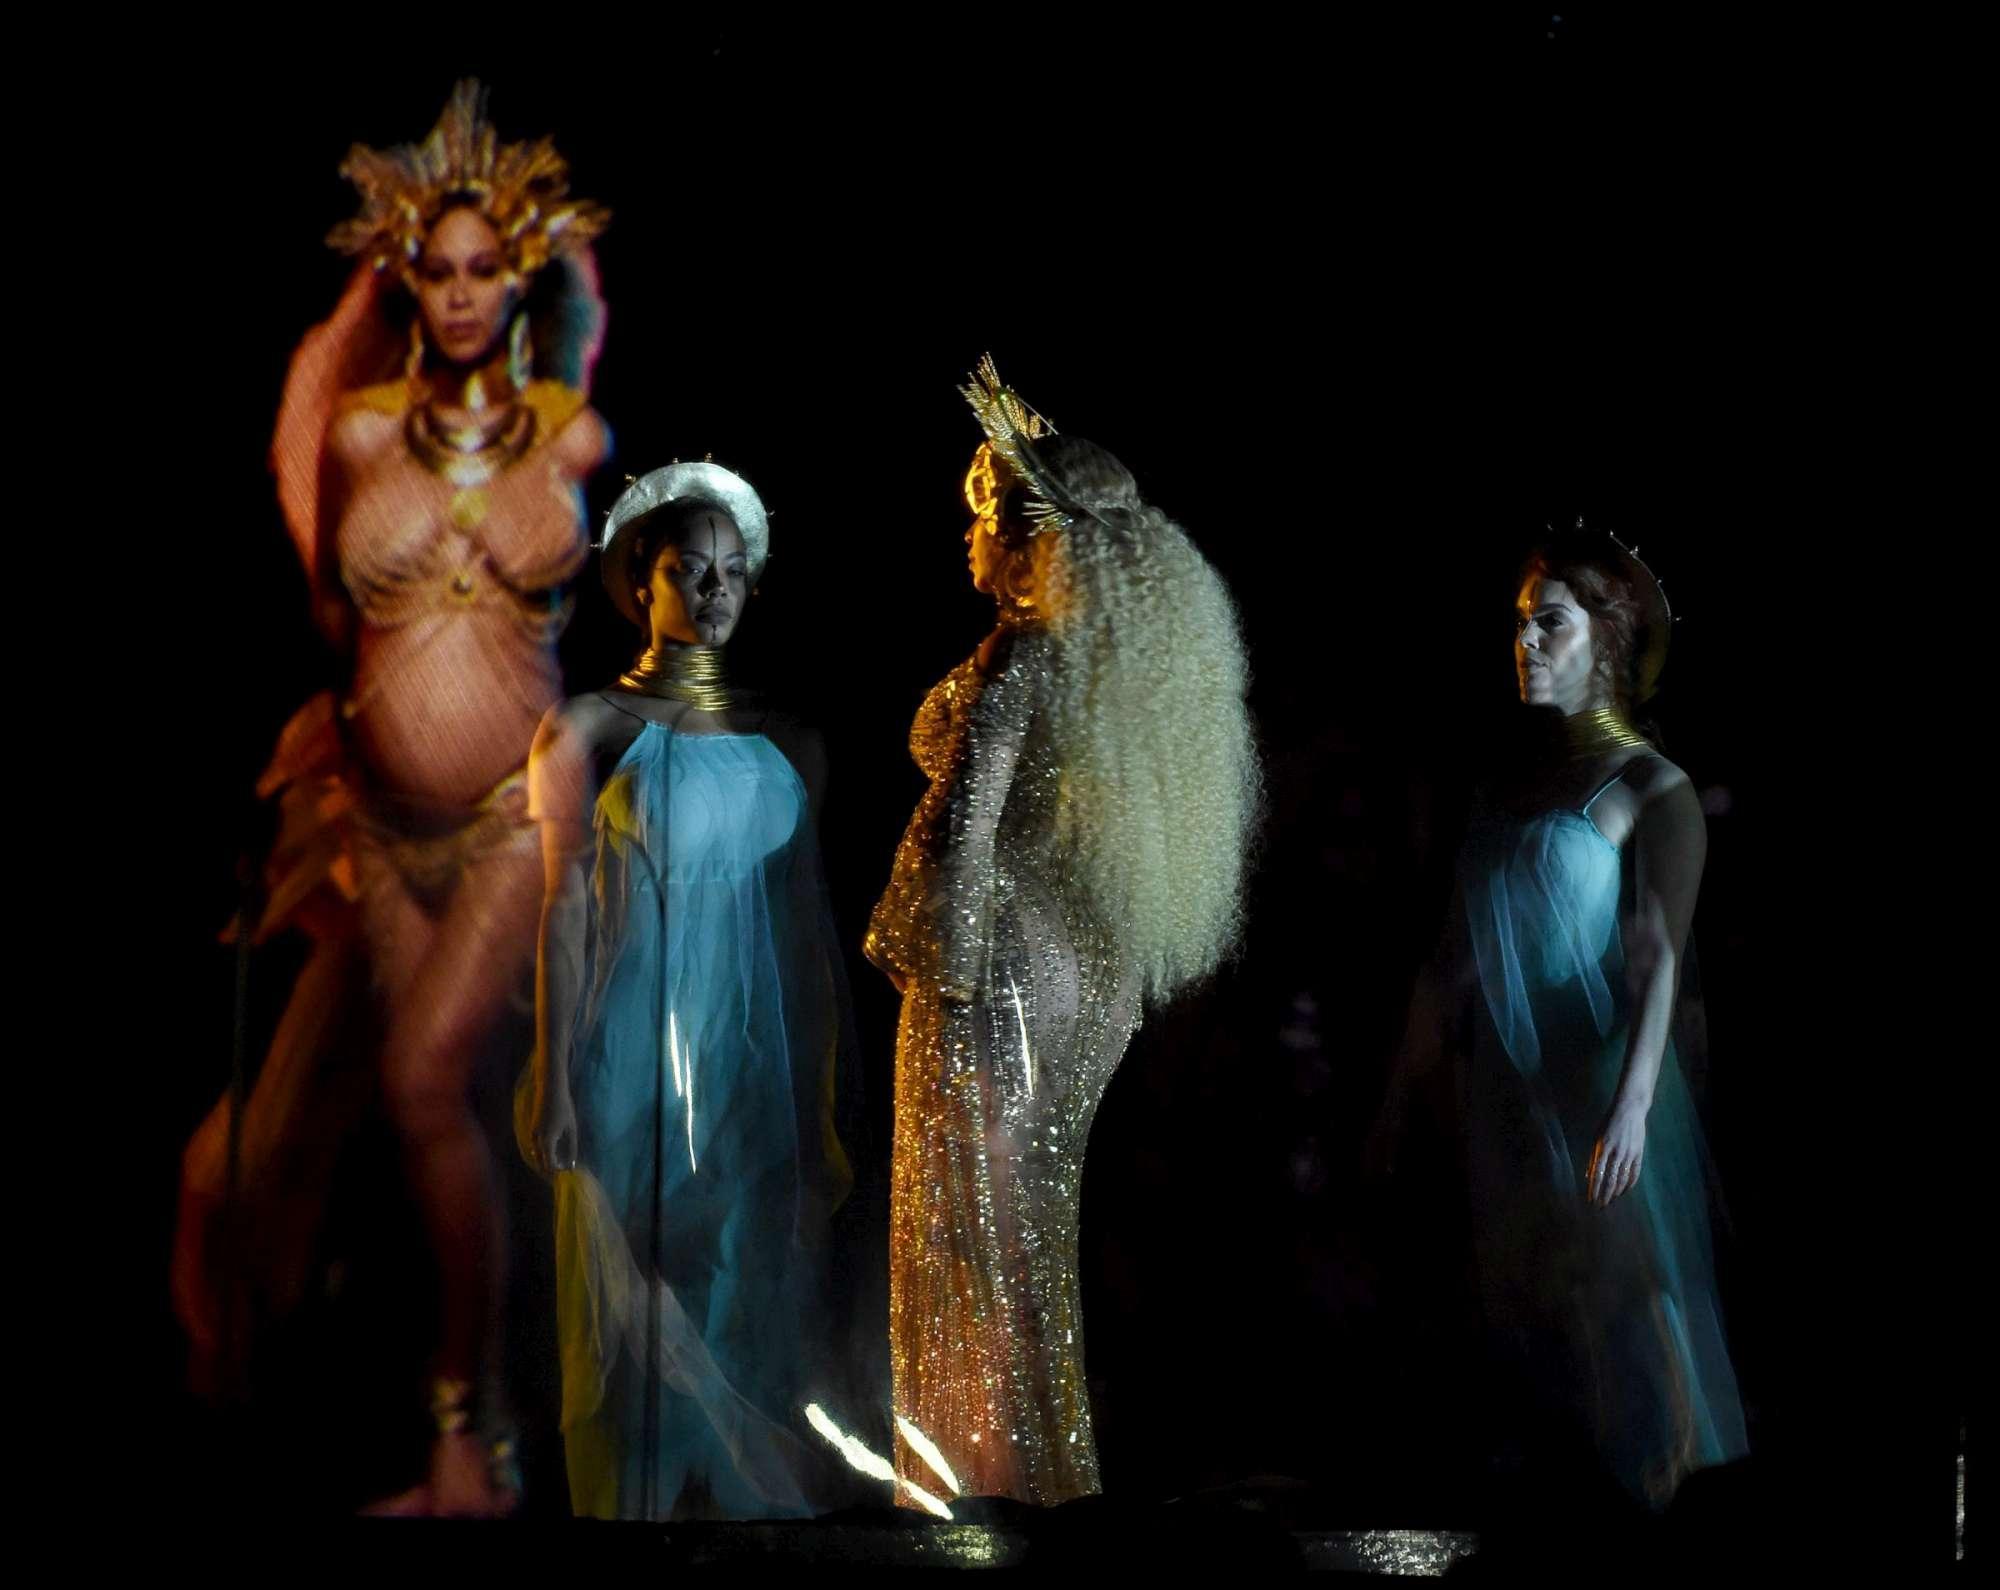 Beyoncé, niente Coachella quest?anno: il dottore glielo vieta